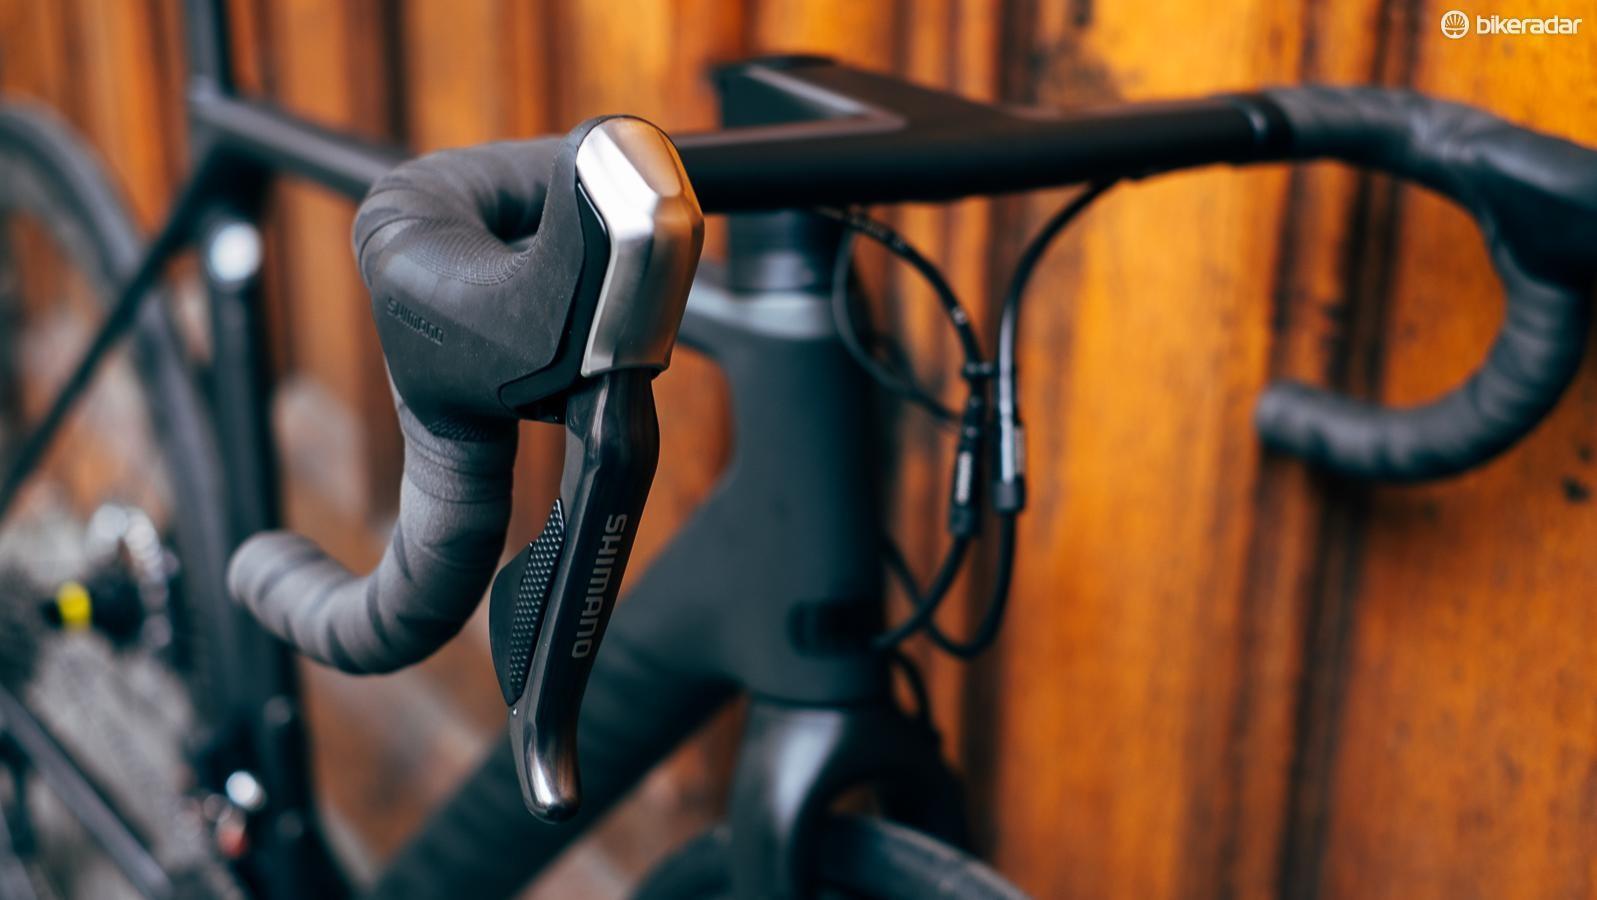 Shimano Di2 ST-R785 levers are popular with BikeRadar testers